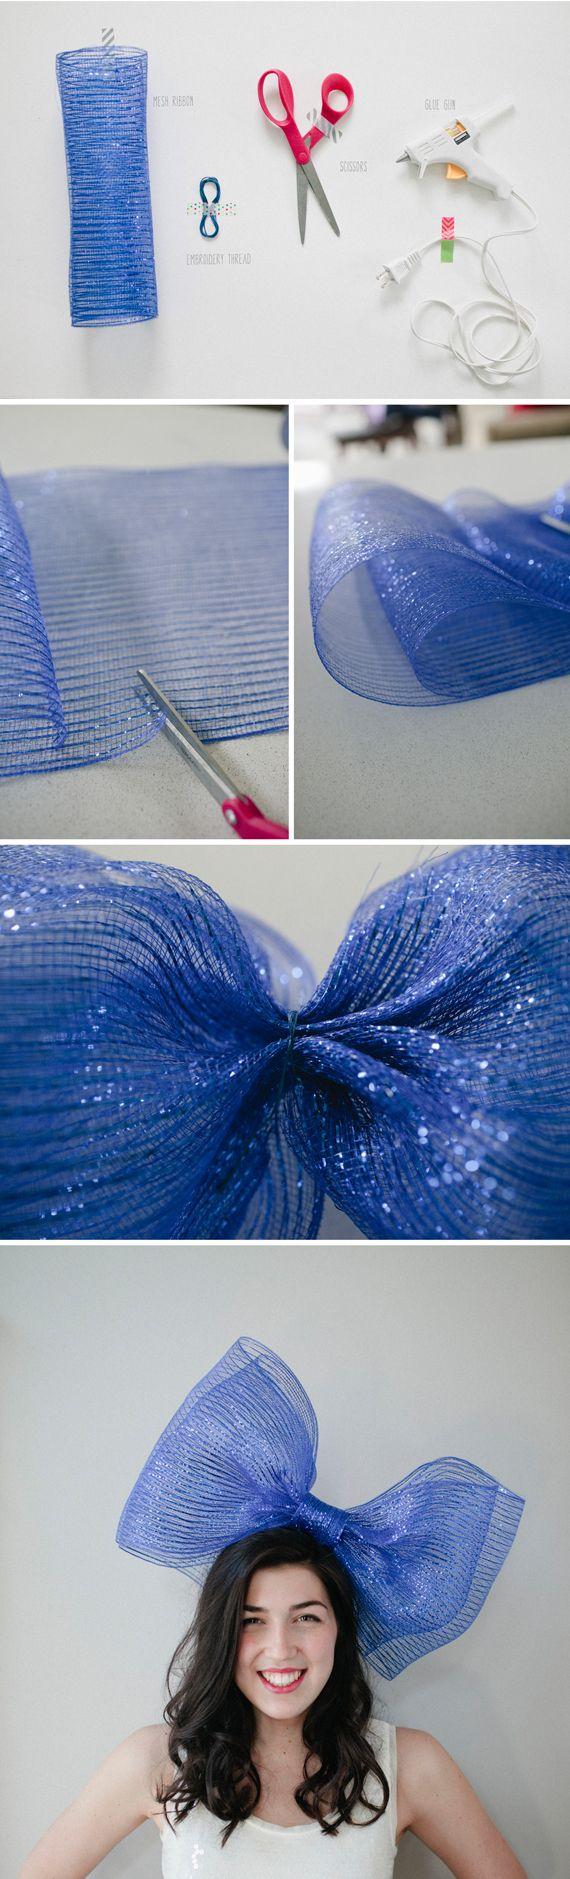 big-bow-party-hat.jpg 570×1,879 pixels